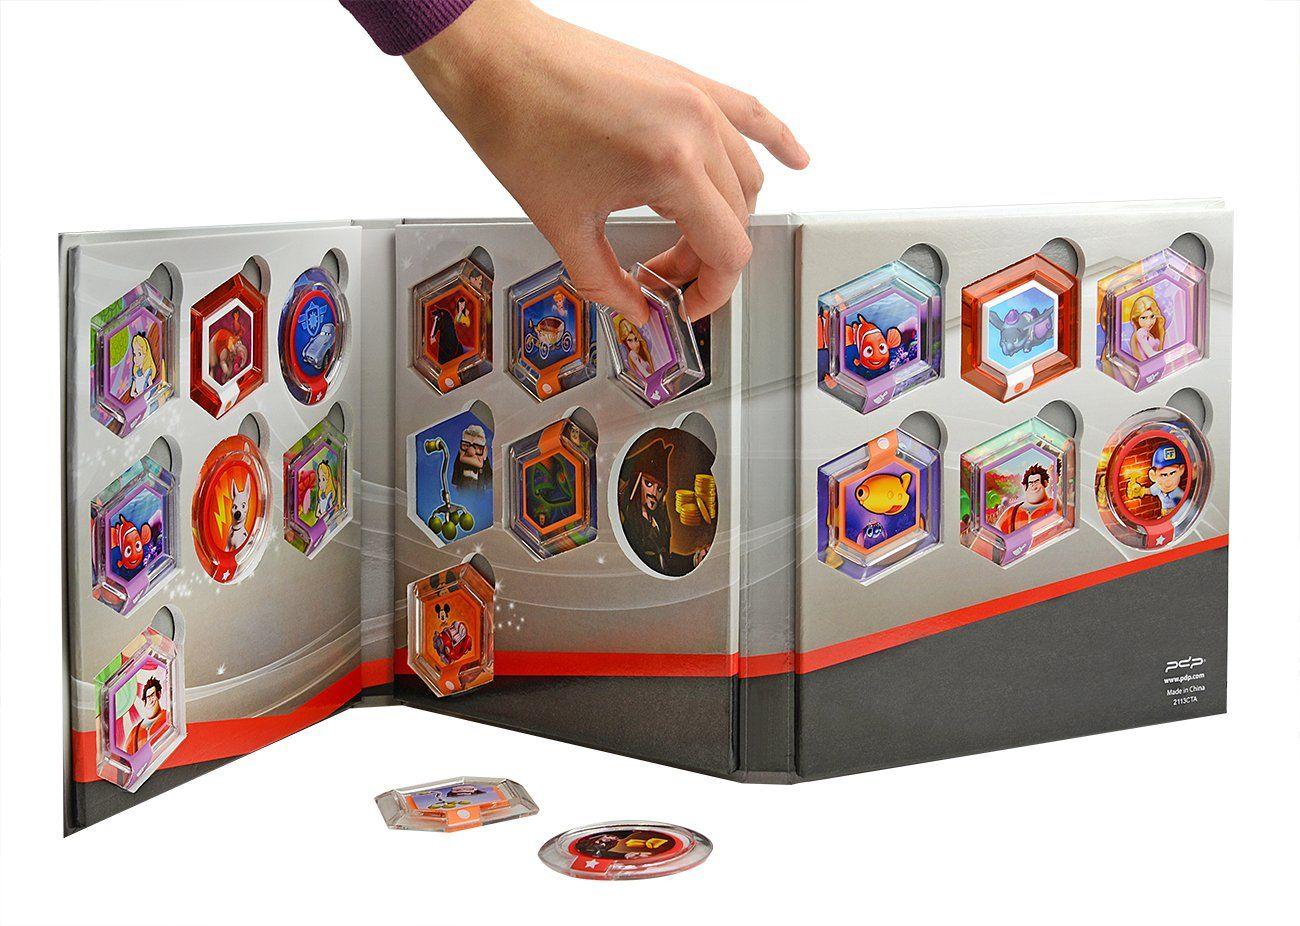 Disney infinity power disk album holds 20 ps3xbox 360